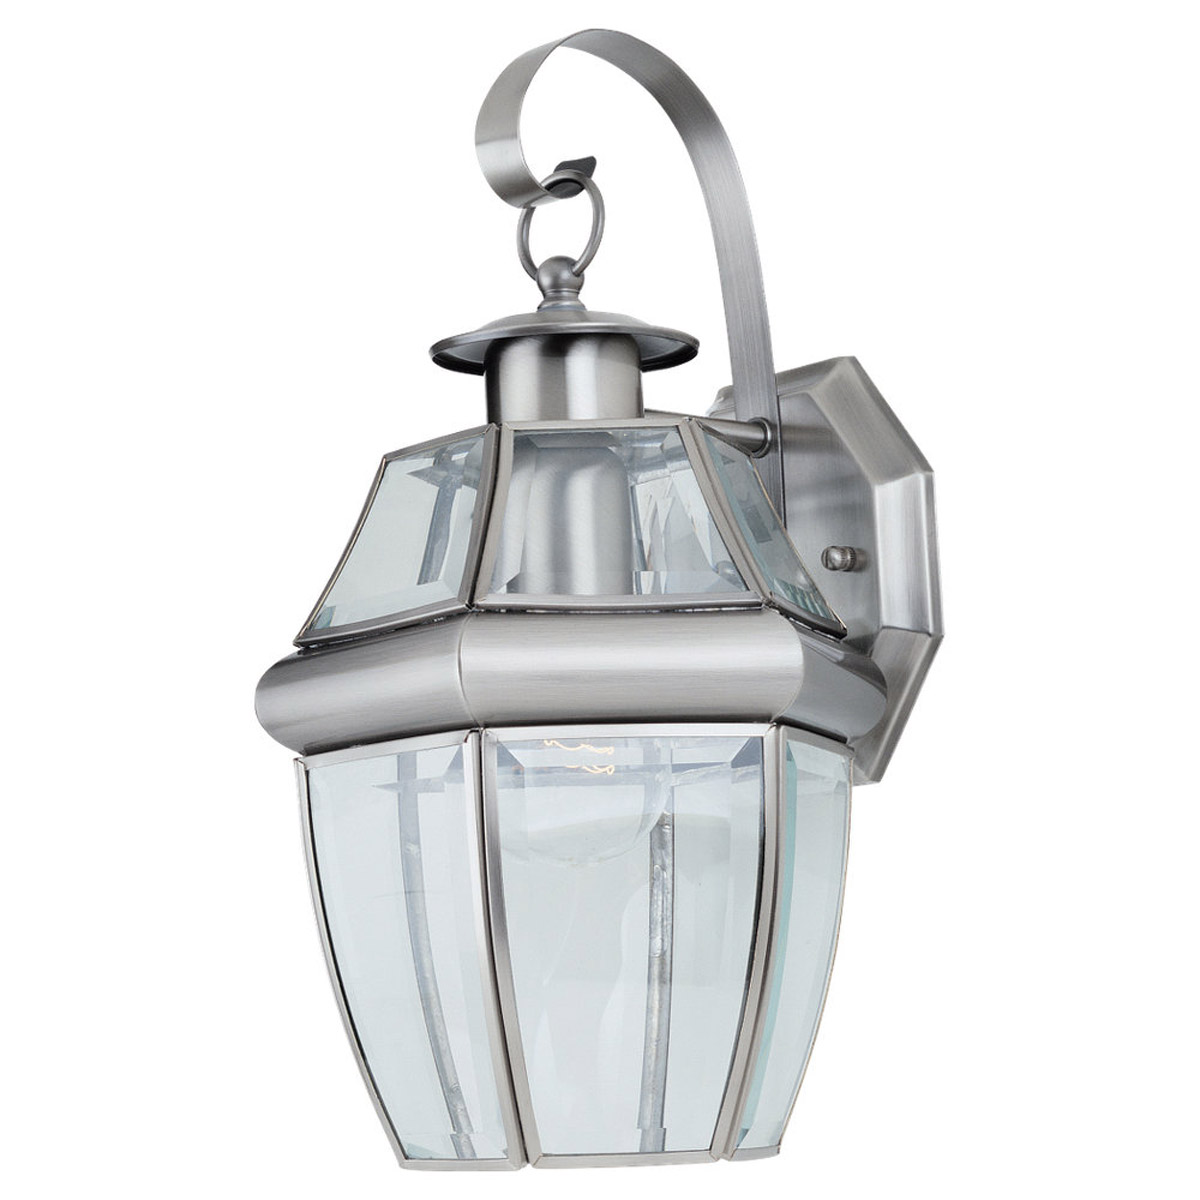 Sea Gull Lighting Lancaster 1 Light Outdoor Wall Lantern in Antique Brushed Nickel 8067-965